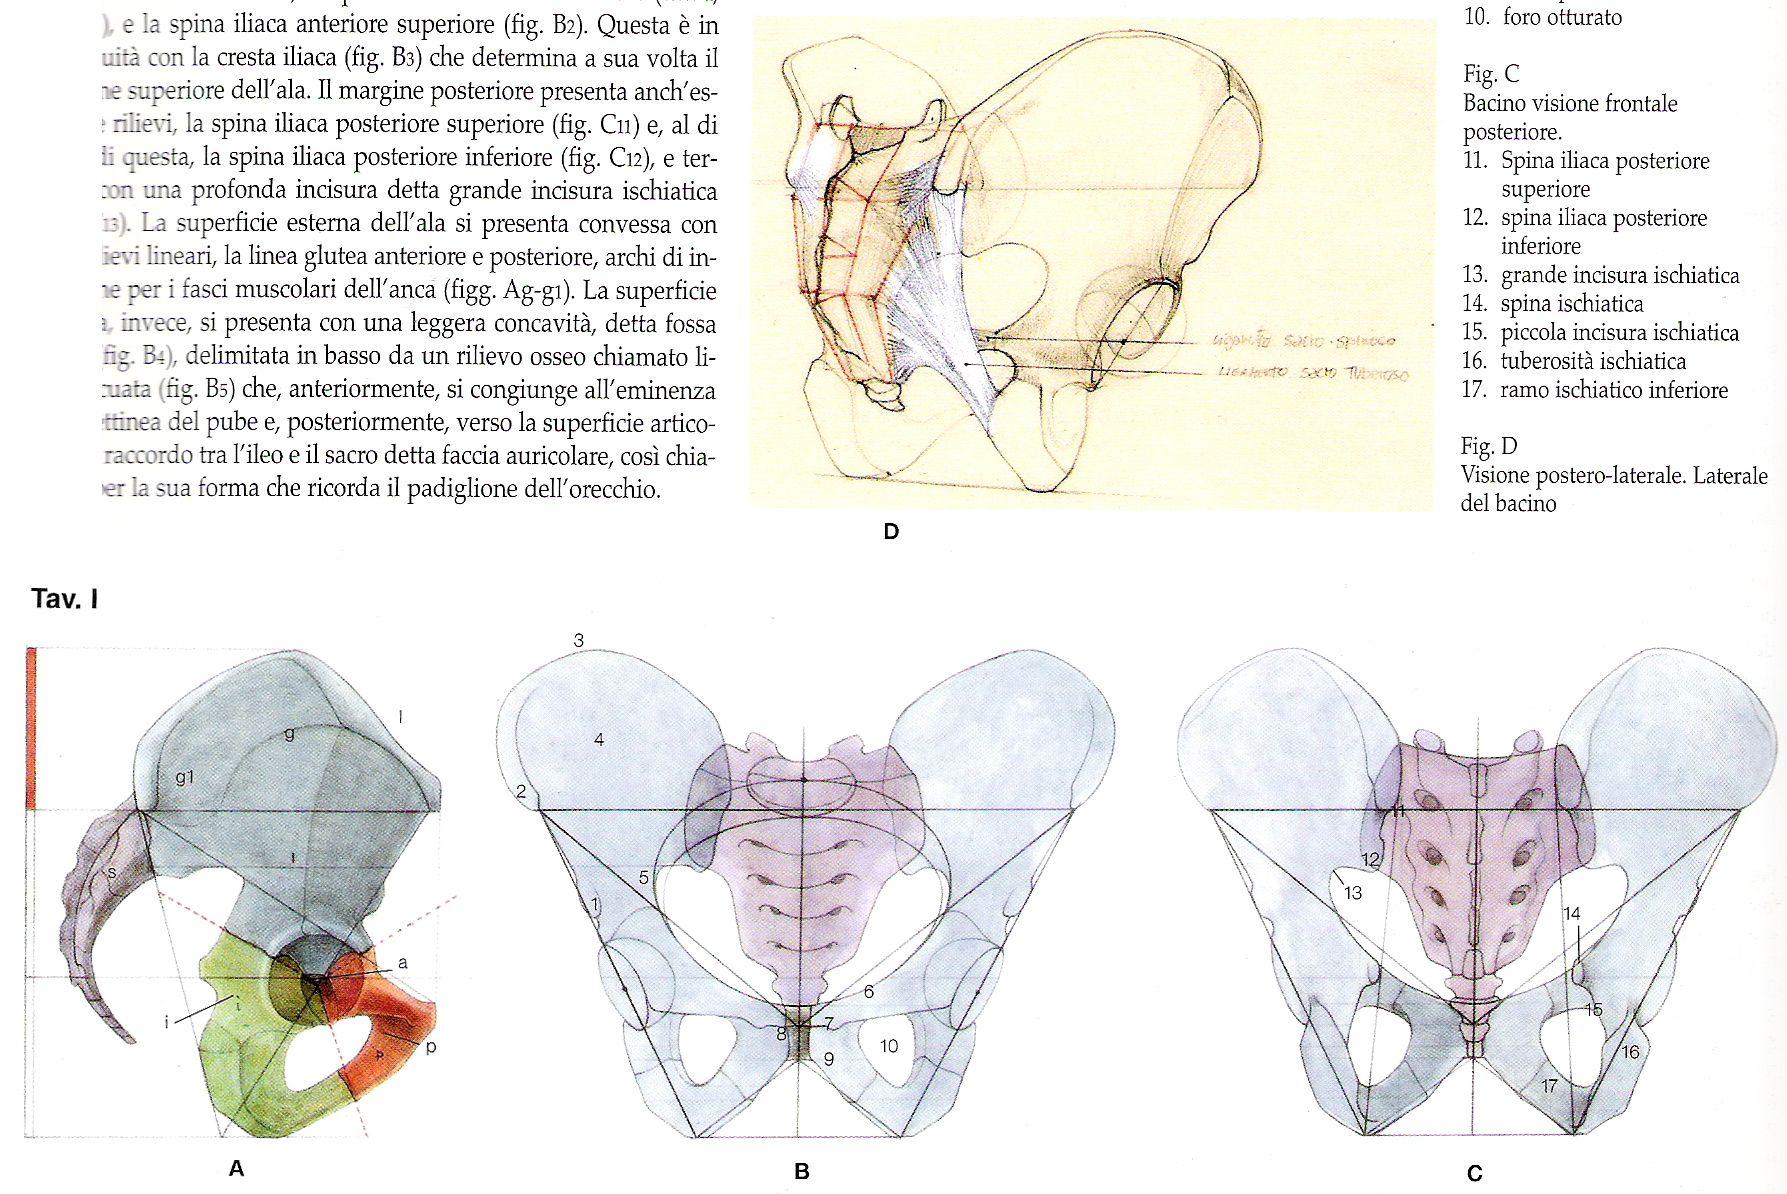 Pin by MrOkin on Anatomie - Bas du corps - Homme   Pinterest ...